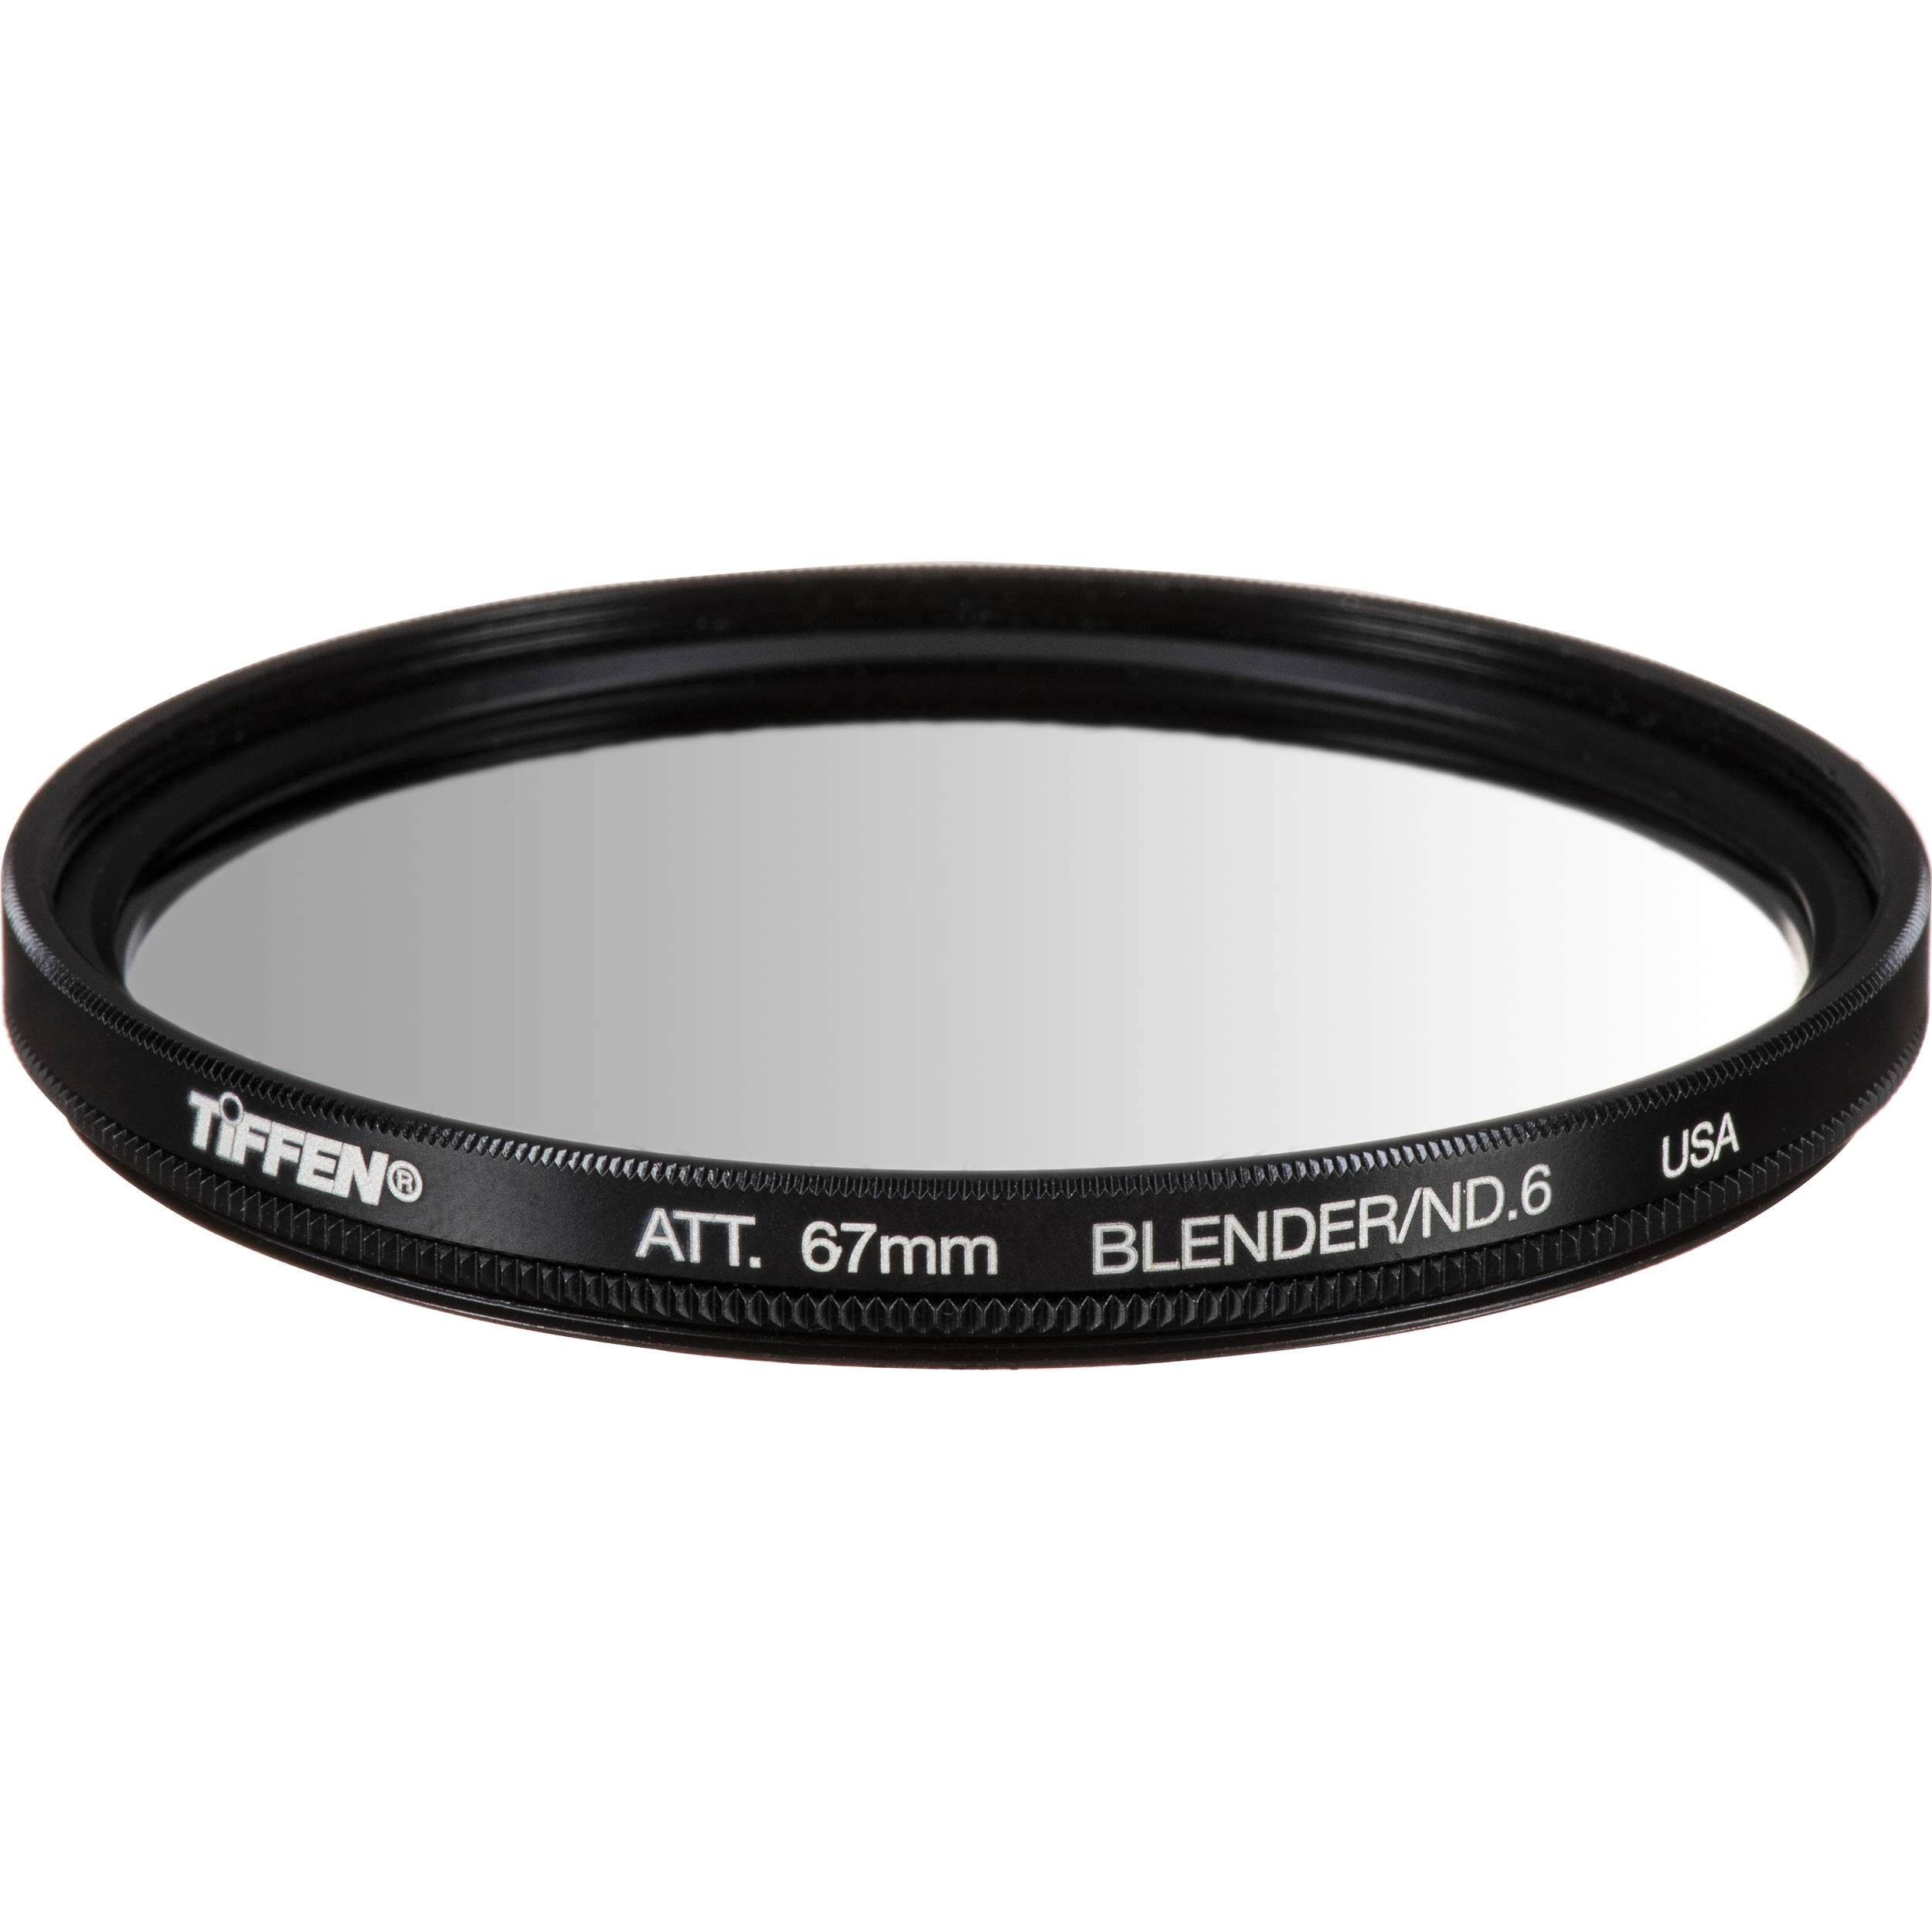 Tiffen 67mm Graduated Neutral Density Attenuator/Blender 0.6 Filter (2-Stop)